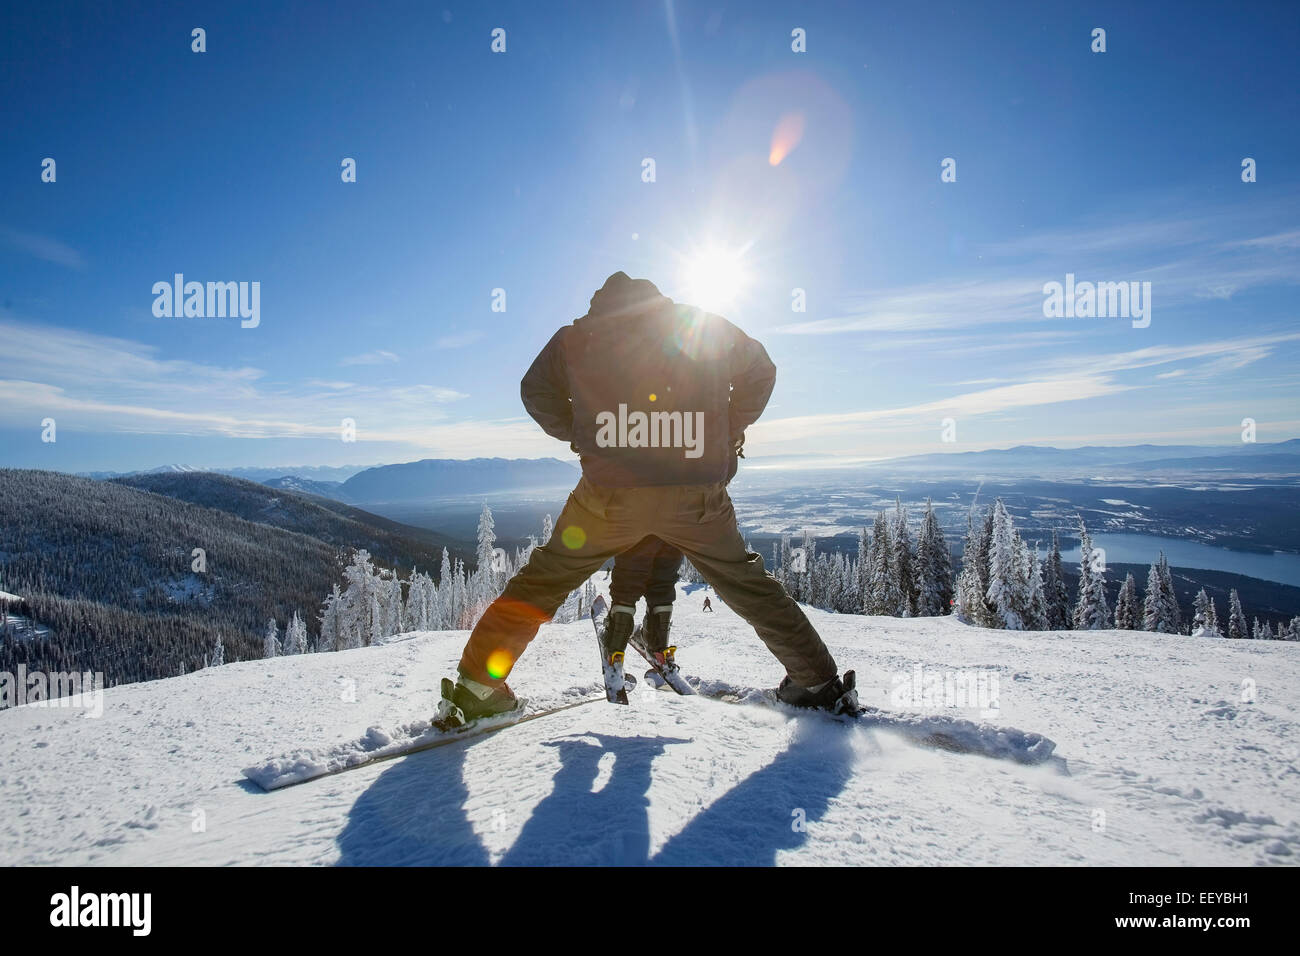 USA, Montana, Felchen, Vater mit Sohn (6-7) Skifahren Stockfoto